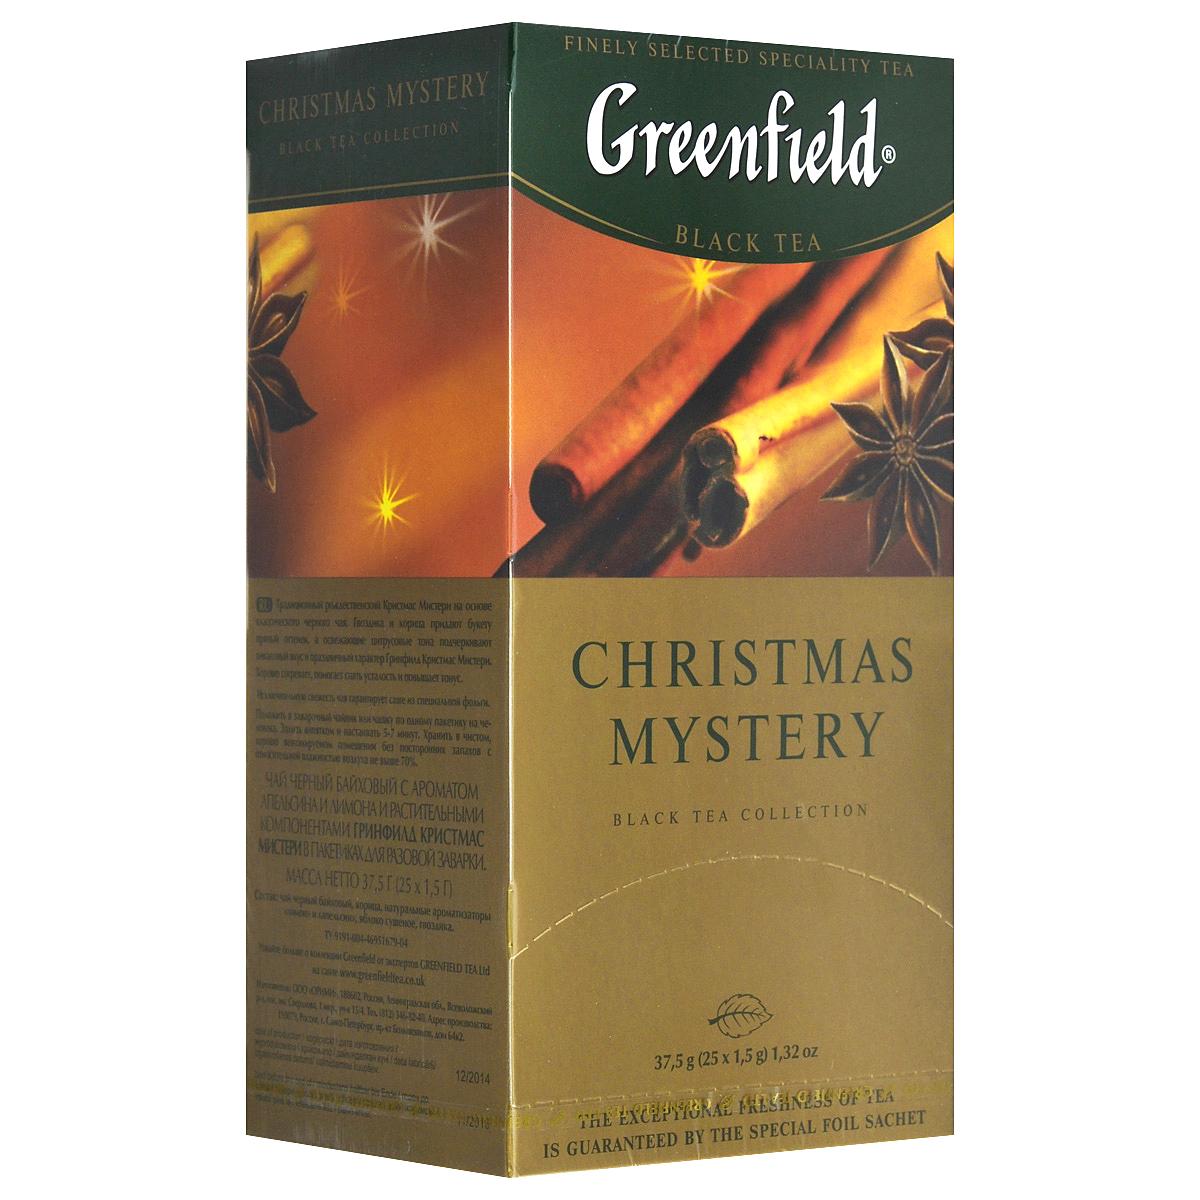 Greenfield Christmas Mystery черный чай в пакетиках, 25 шт greenfield christmas mystery черный листовой чай 100 г